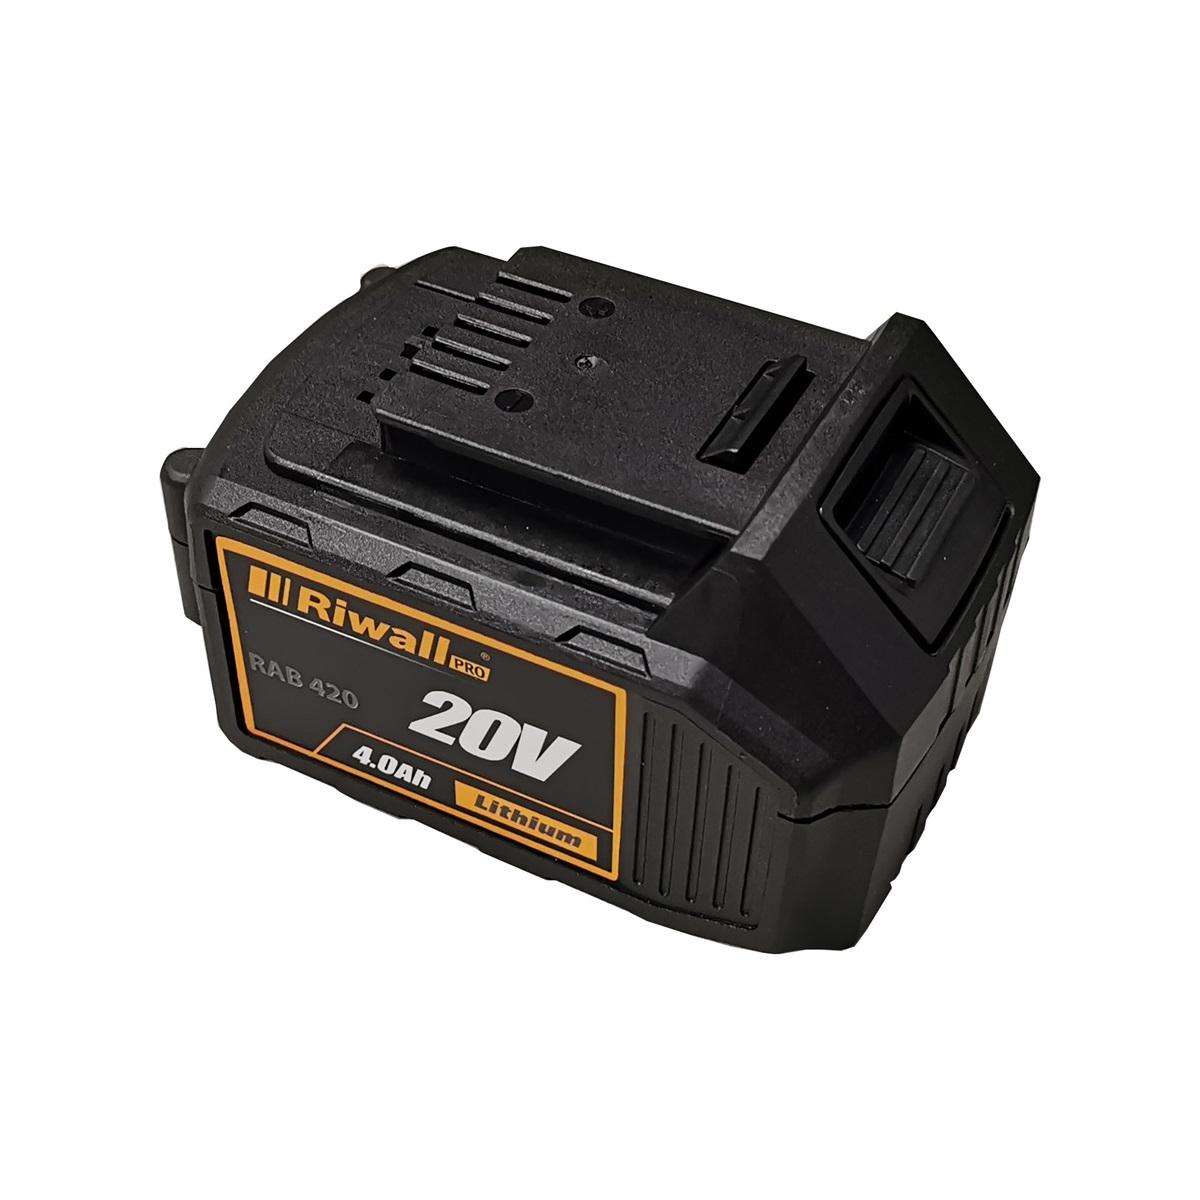 Riwall PRO RAB 420, bateria 20 V (4 Ah)